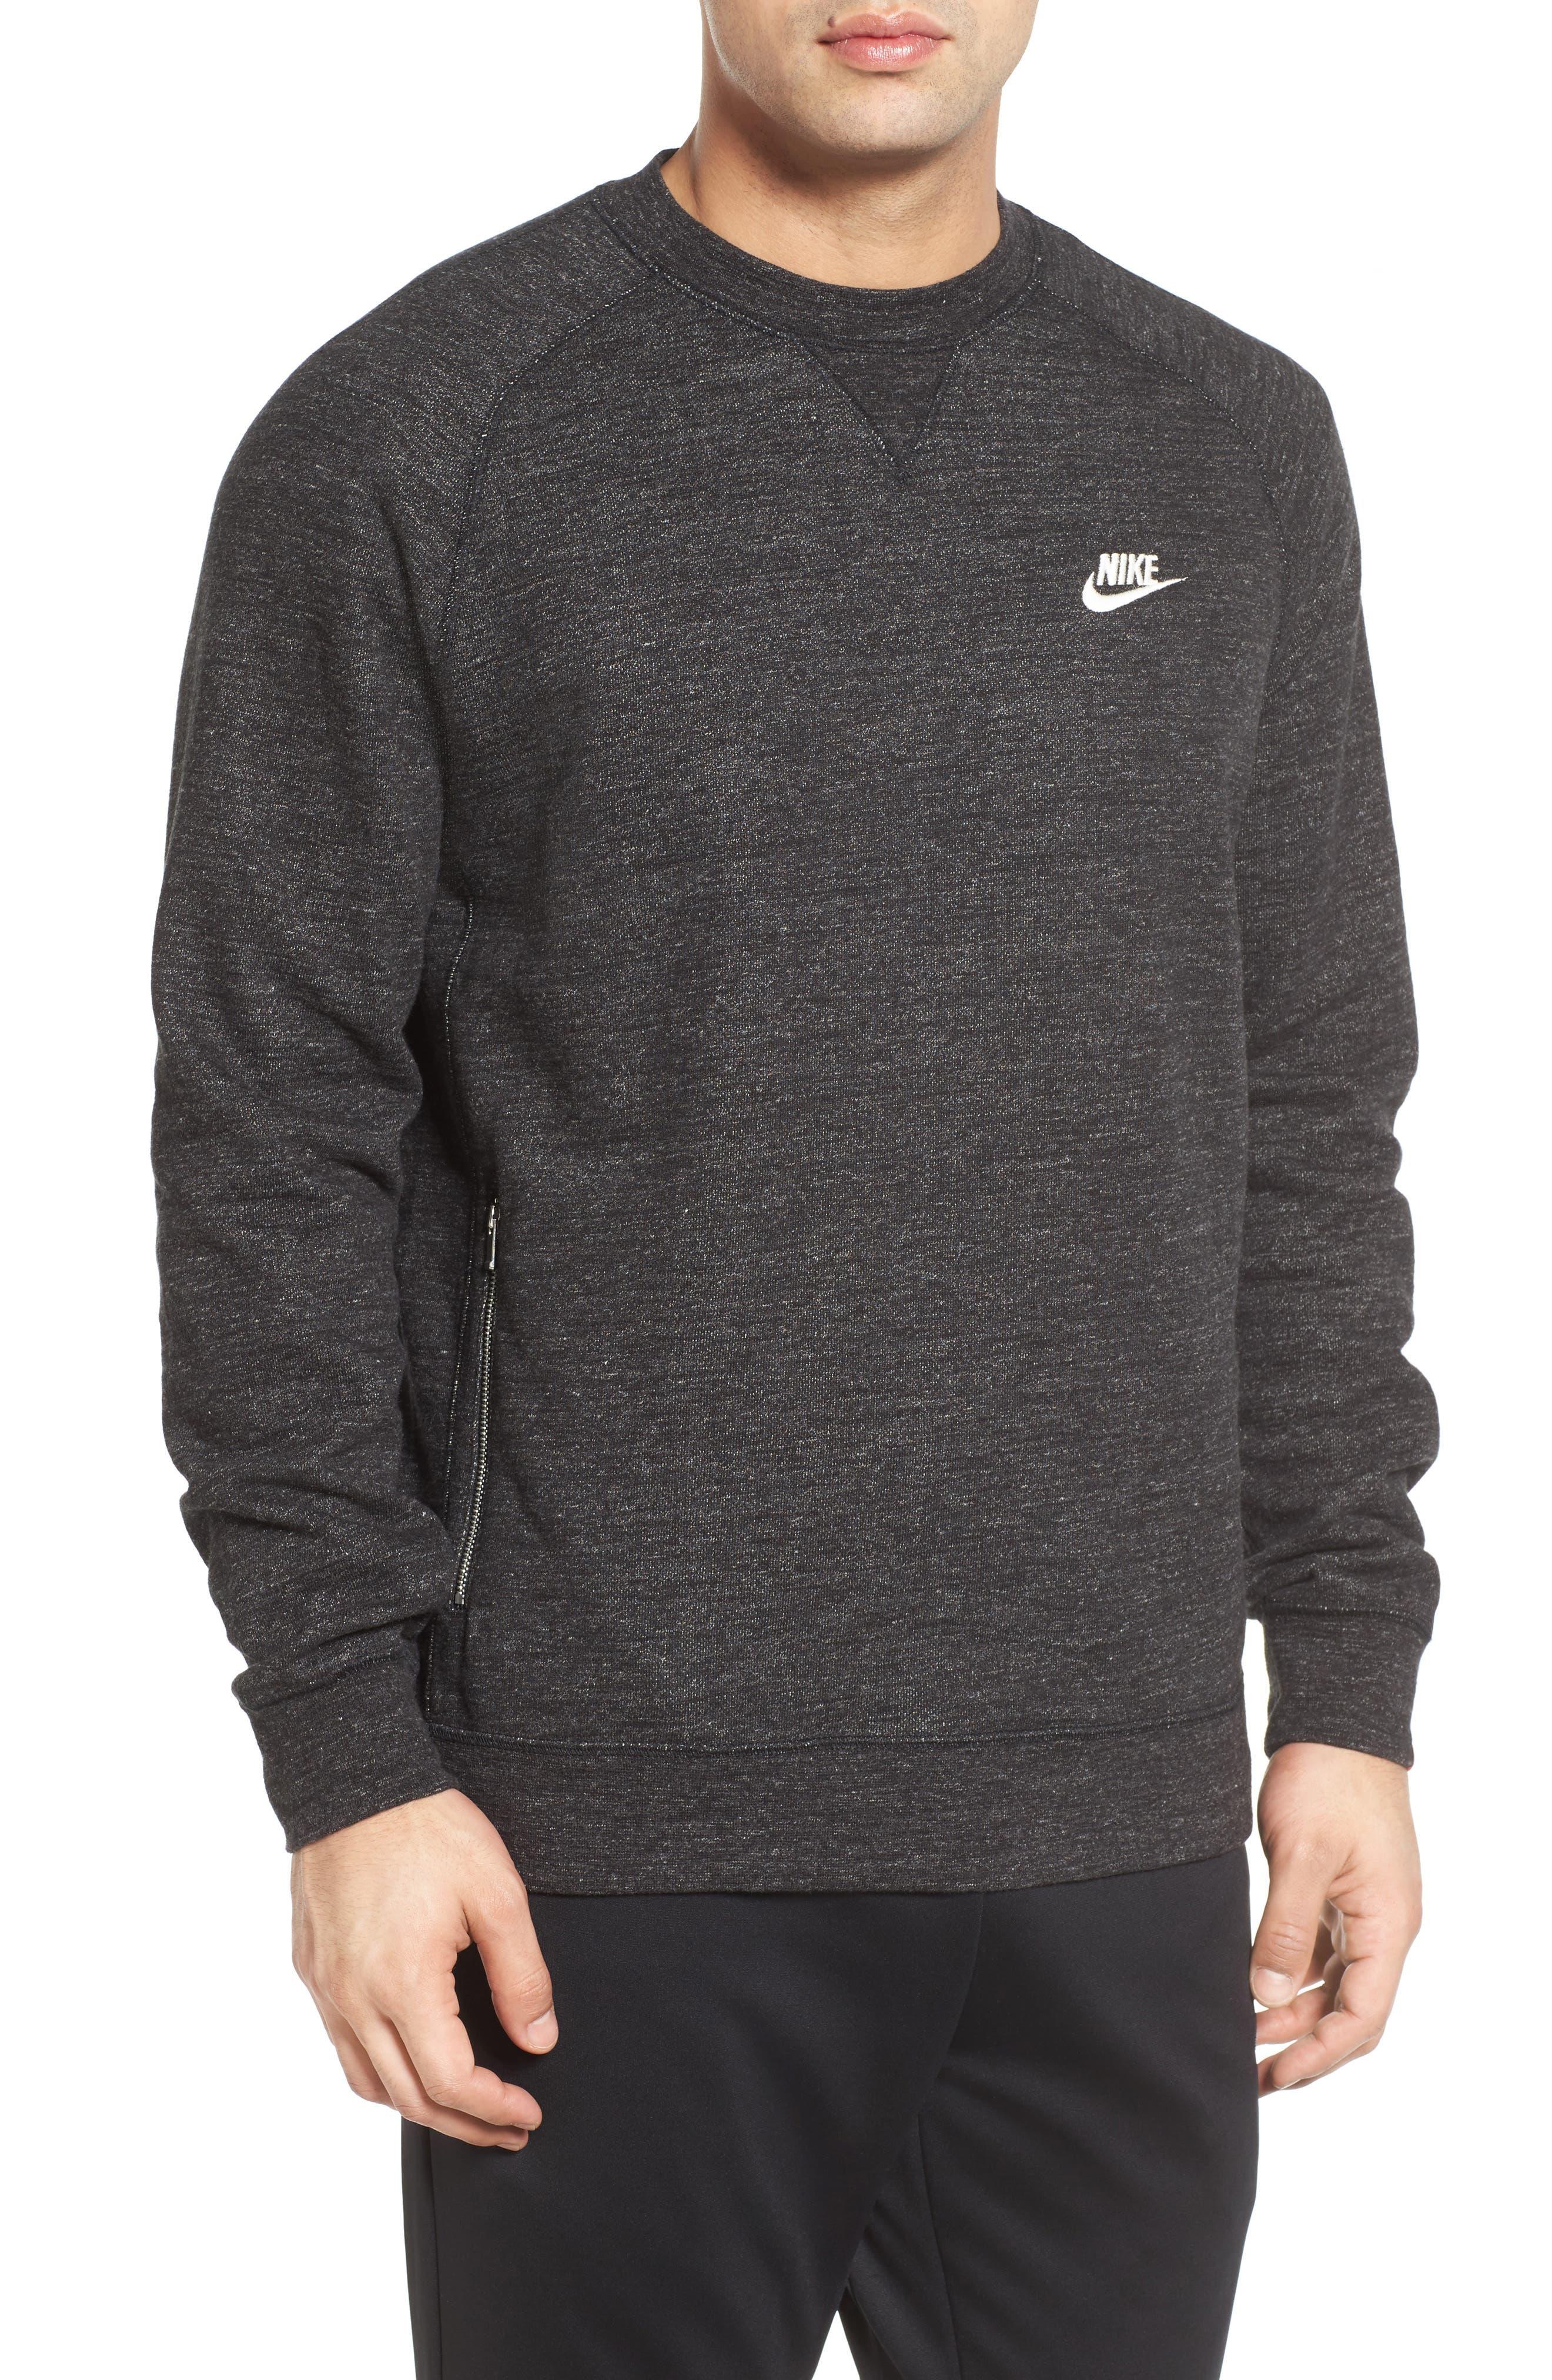 Main Image - Nike Legacy Raglan Crewneck Sweatshirt